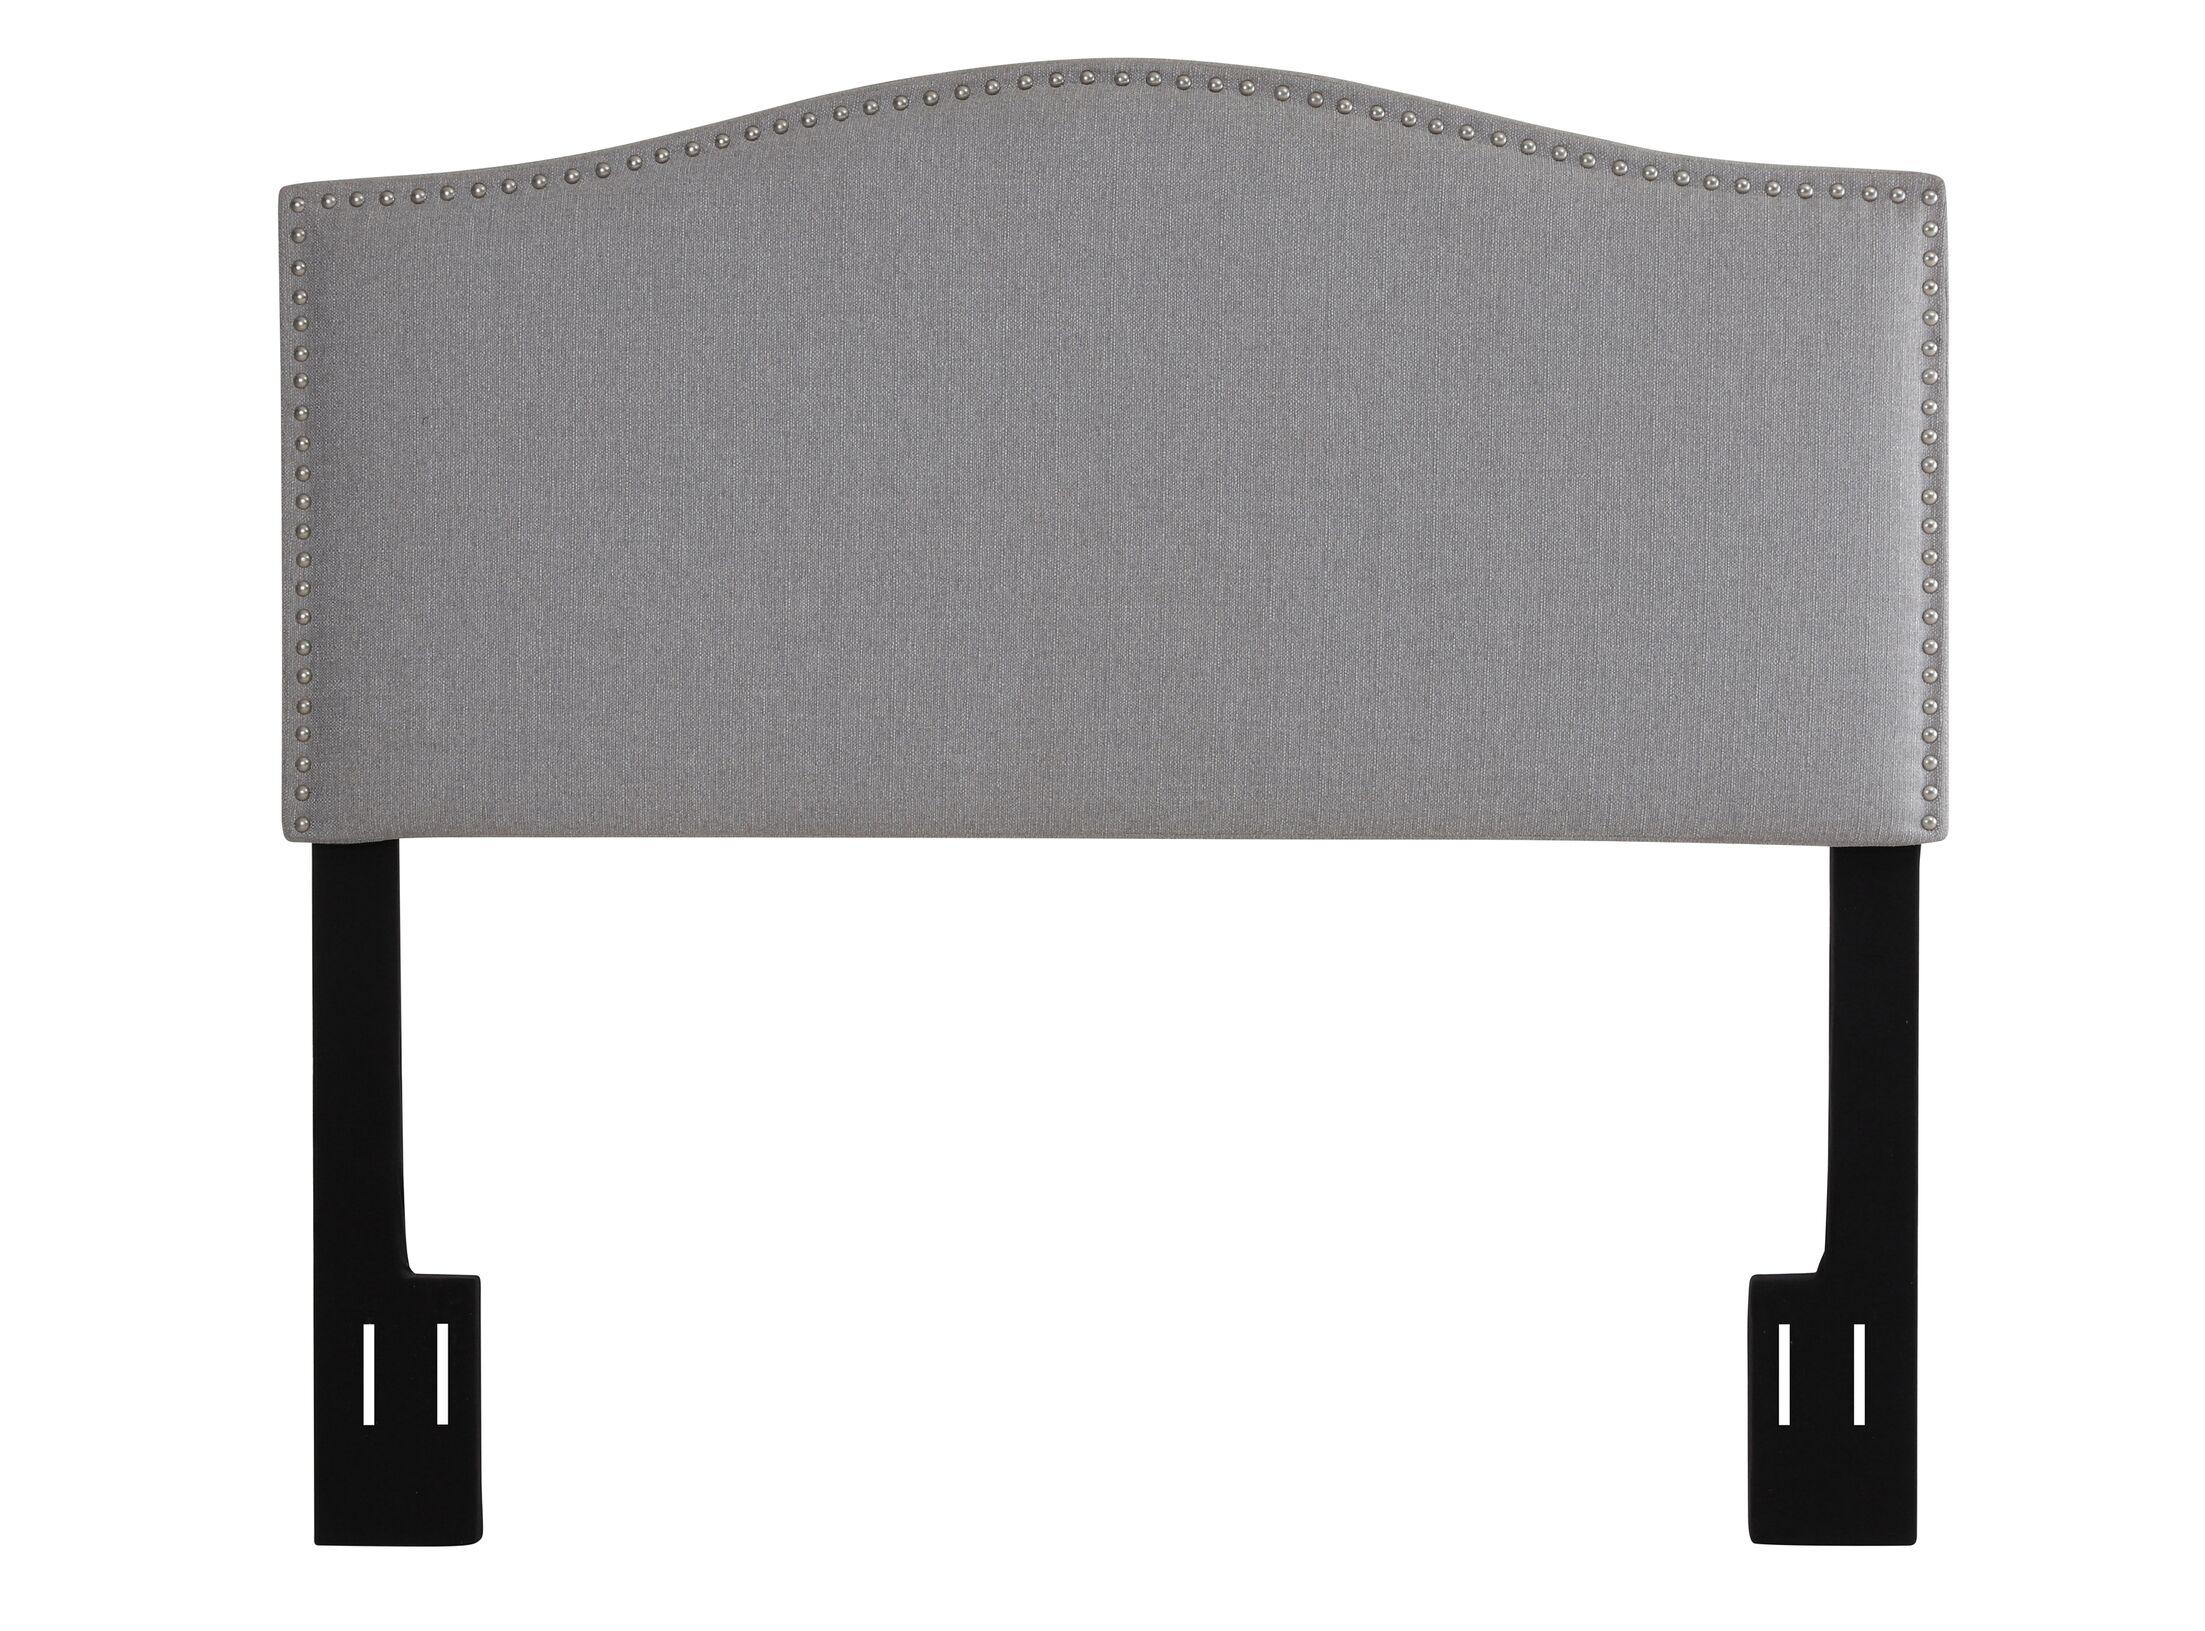 Laivai Upholstered Panel Headboard Upholstery: Dove Gray